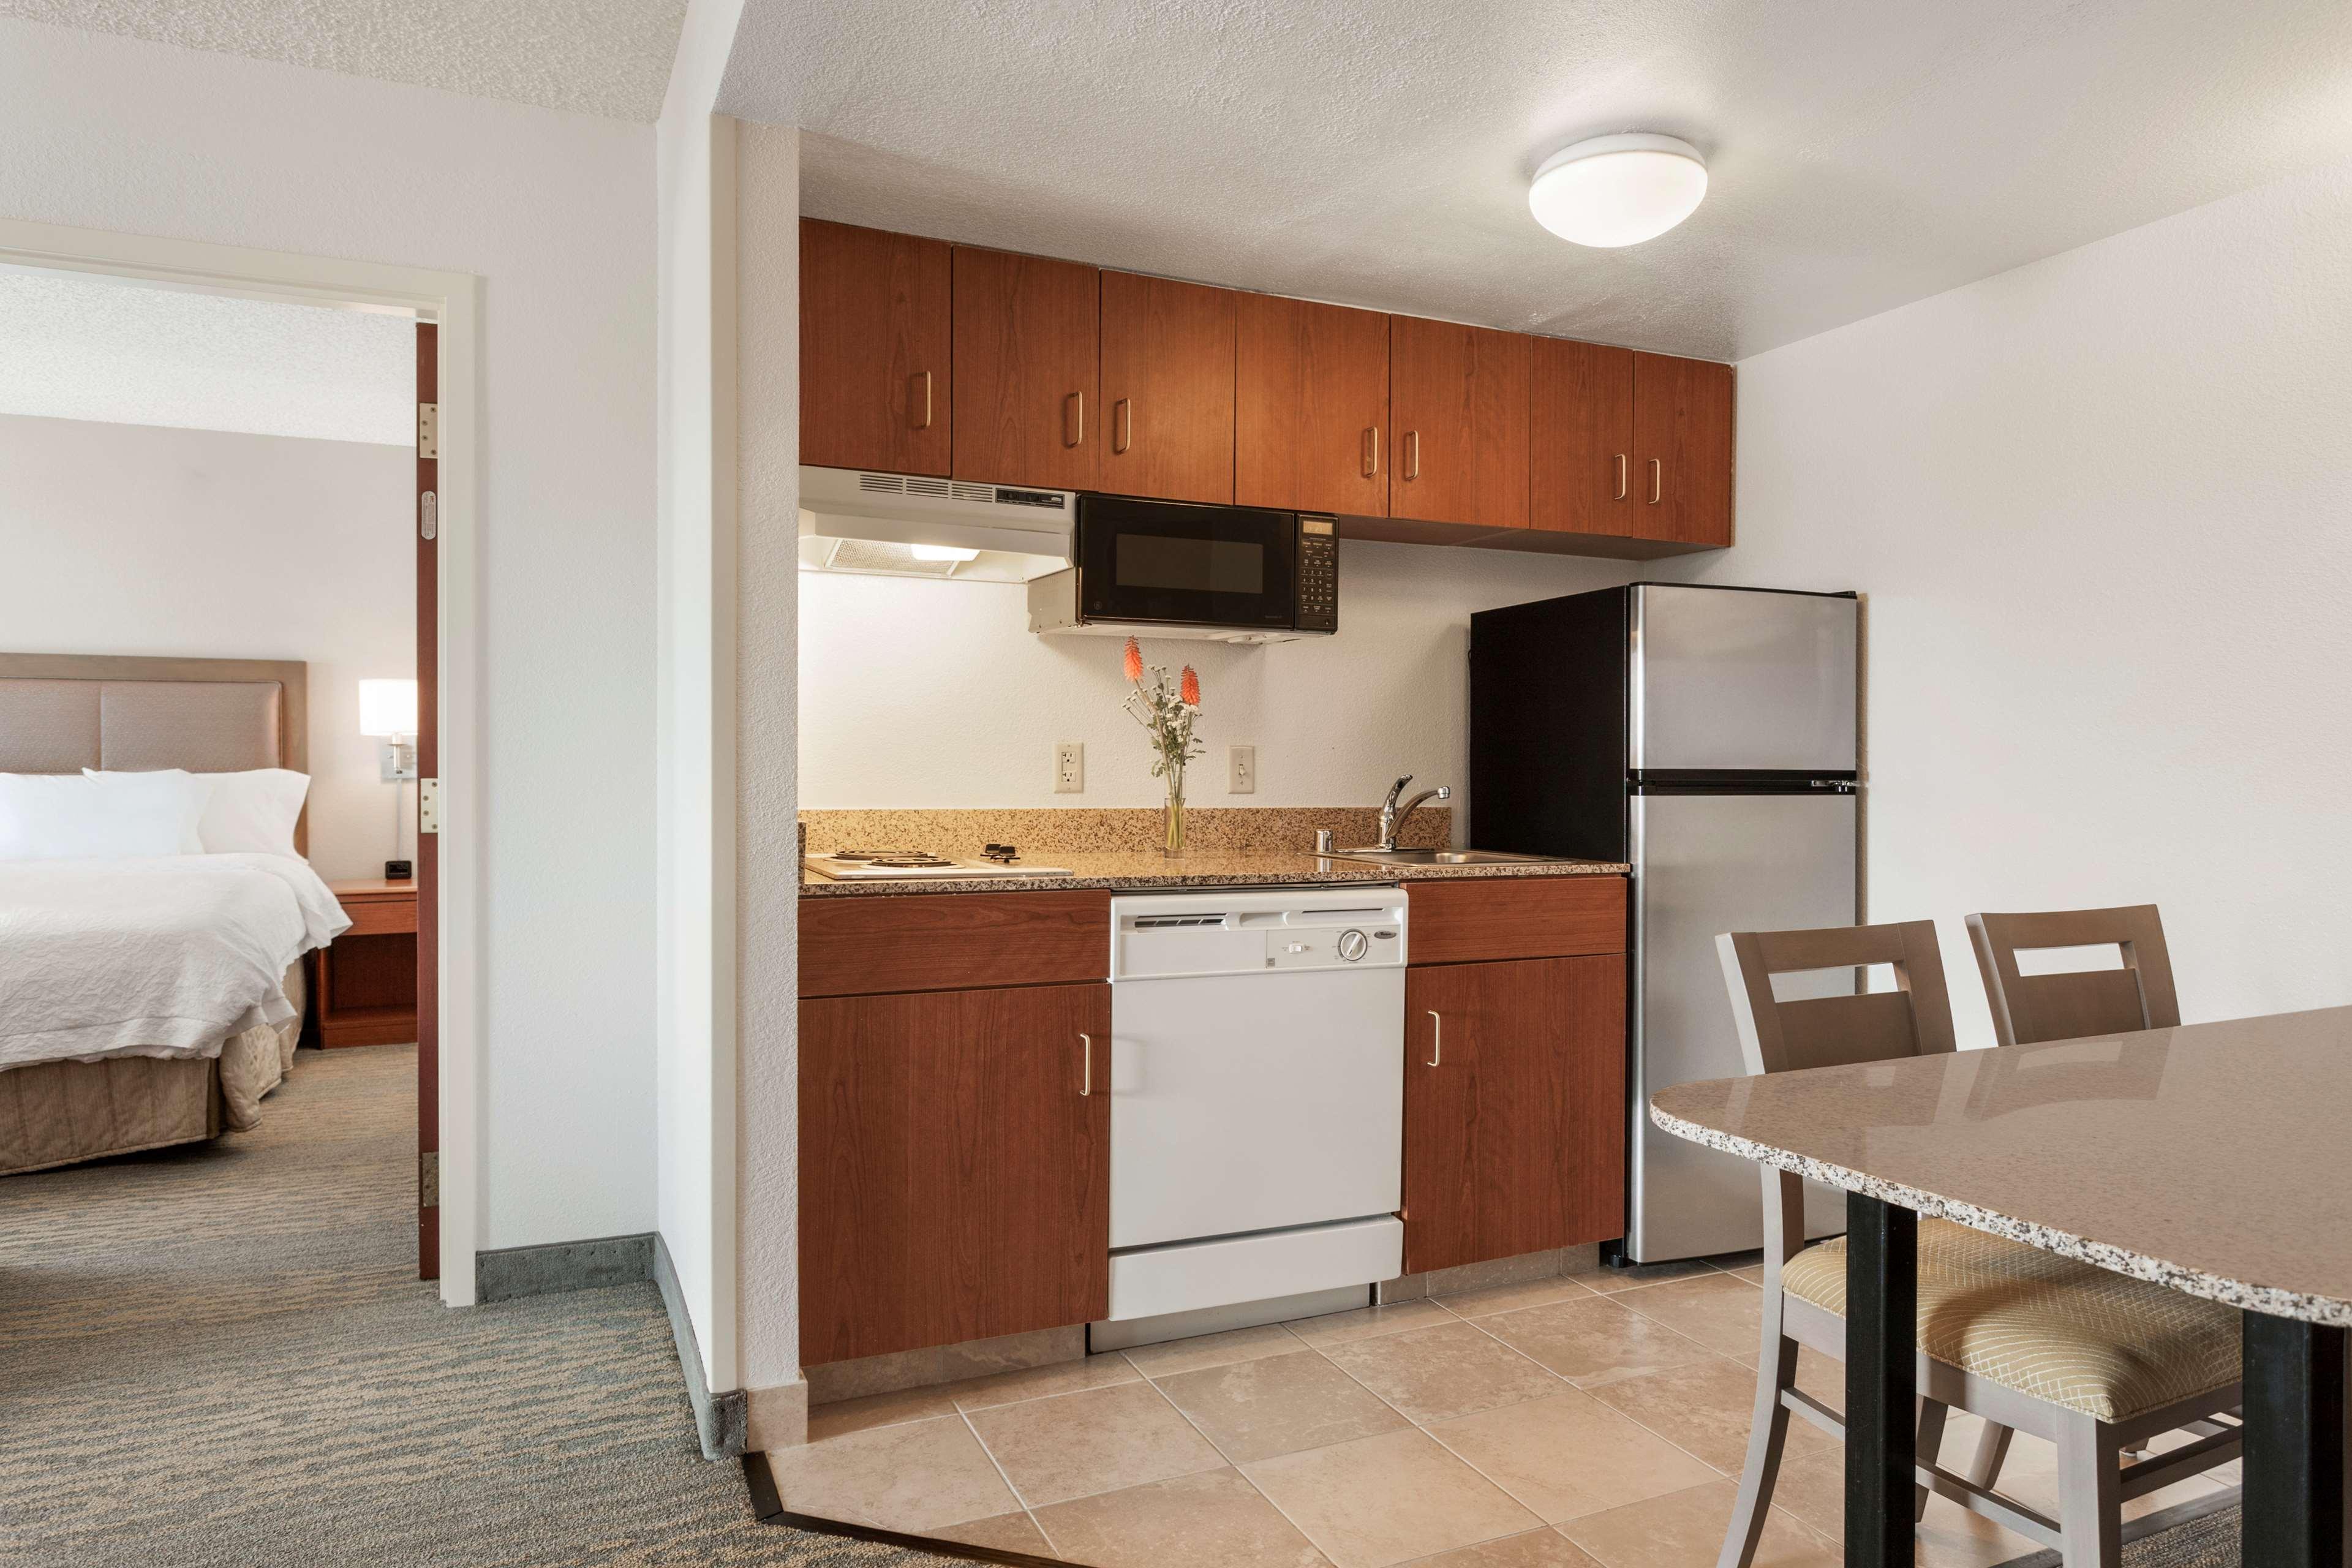 Hampton Inn & Suites Denver-Cherry Creek image 22